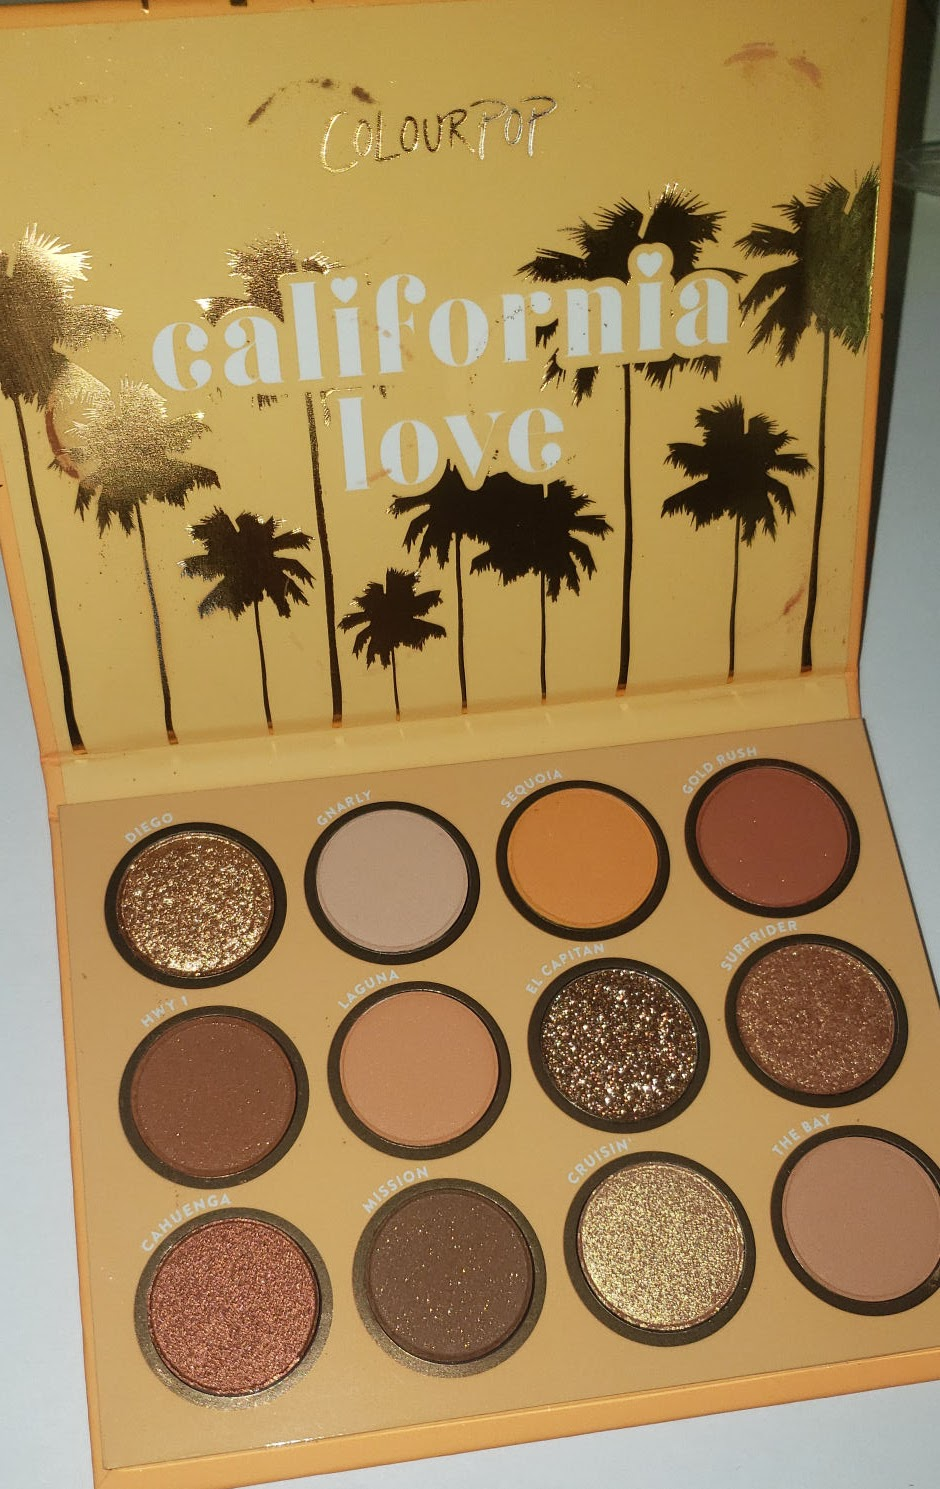 California Love Eyeshadow Palette : california, eyeshadow, palette, Makeup, ColourPop, California, Palette